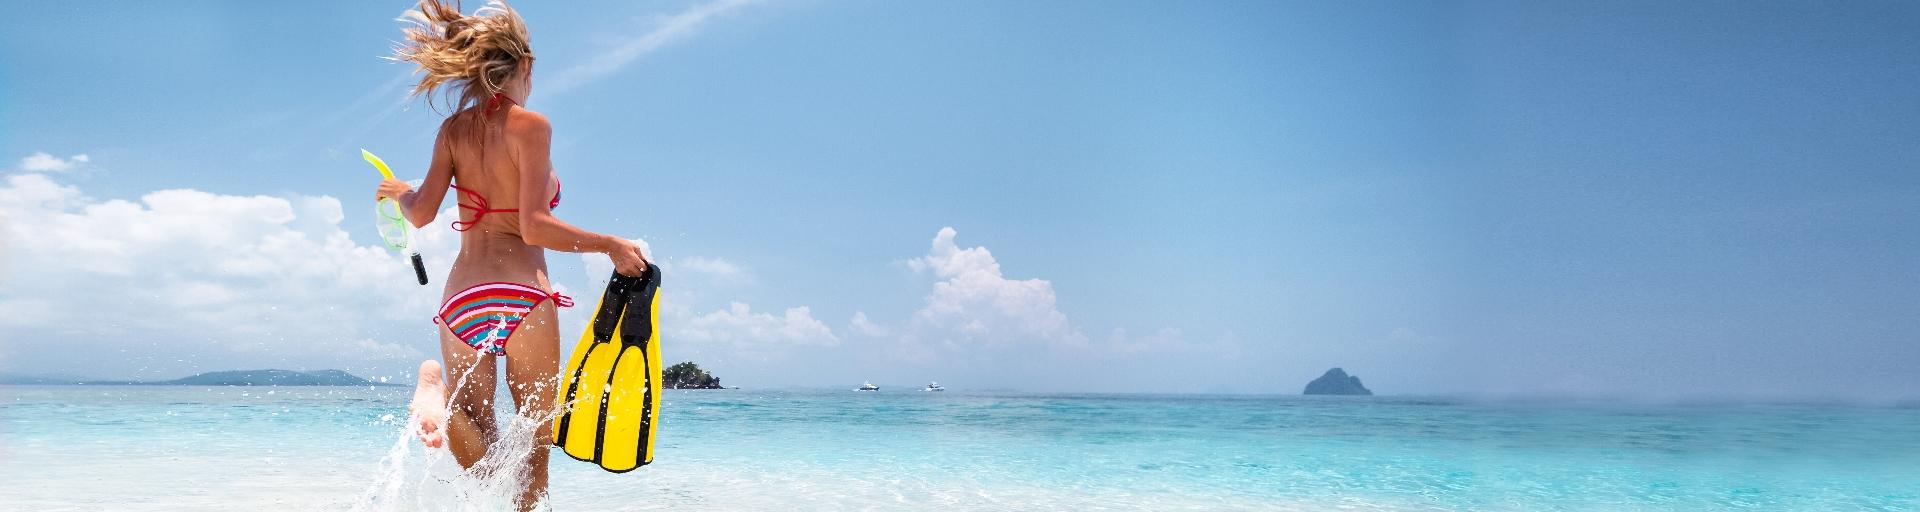 Snorkel en duikartikelen | Summertoys.nl